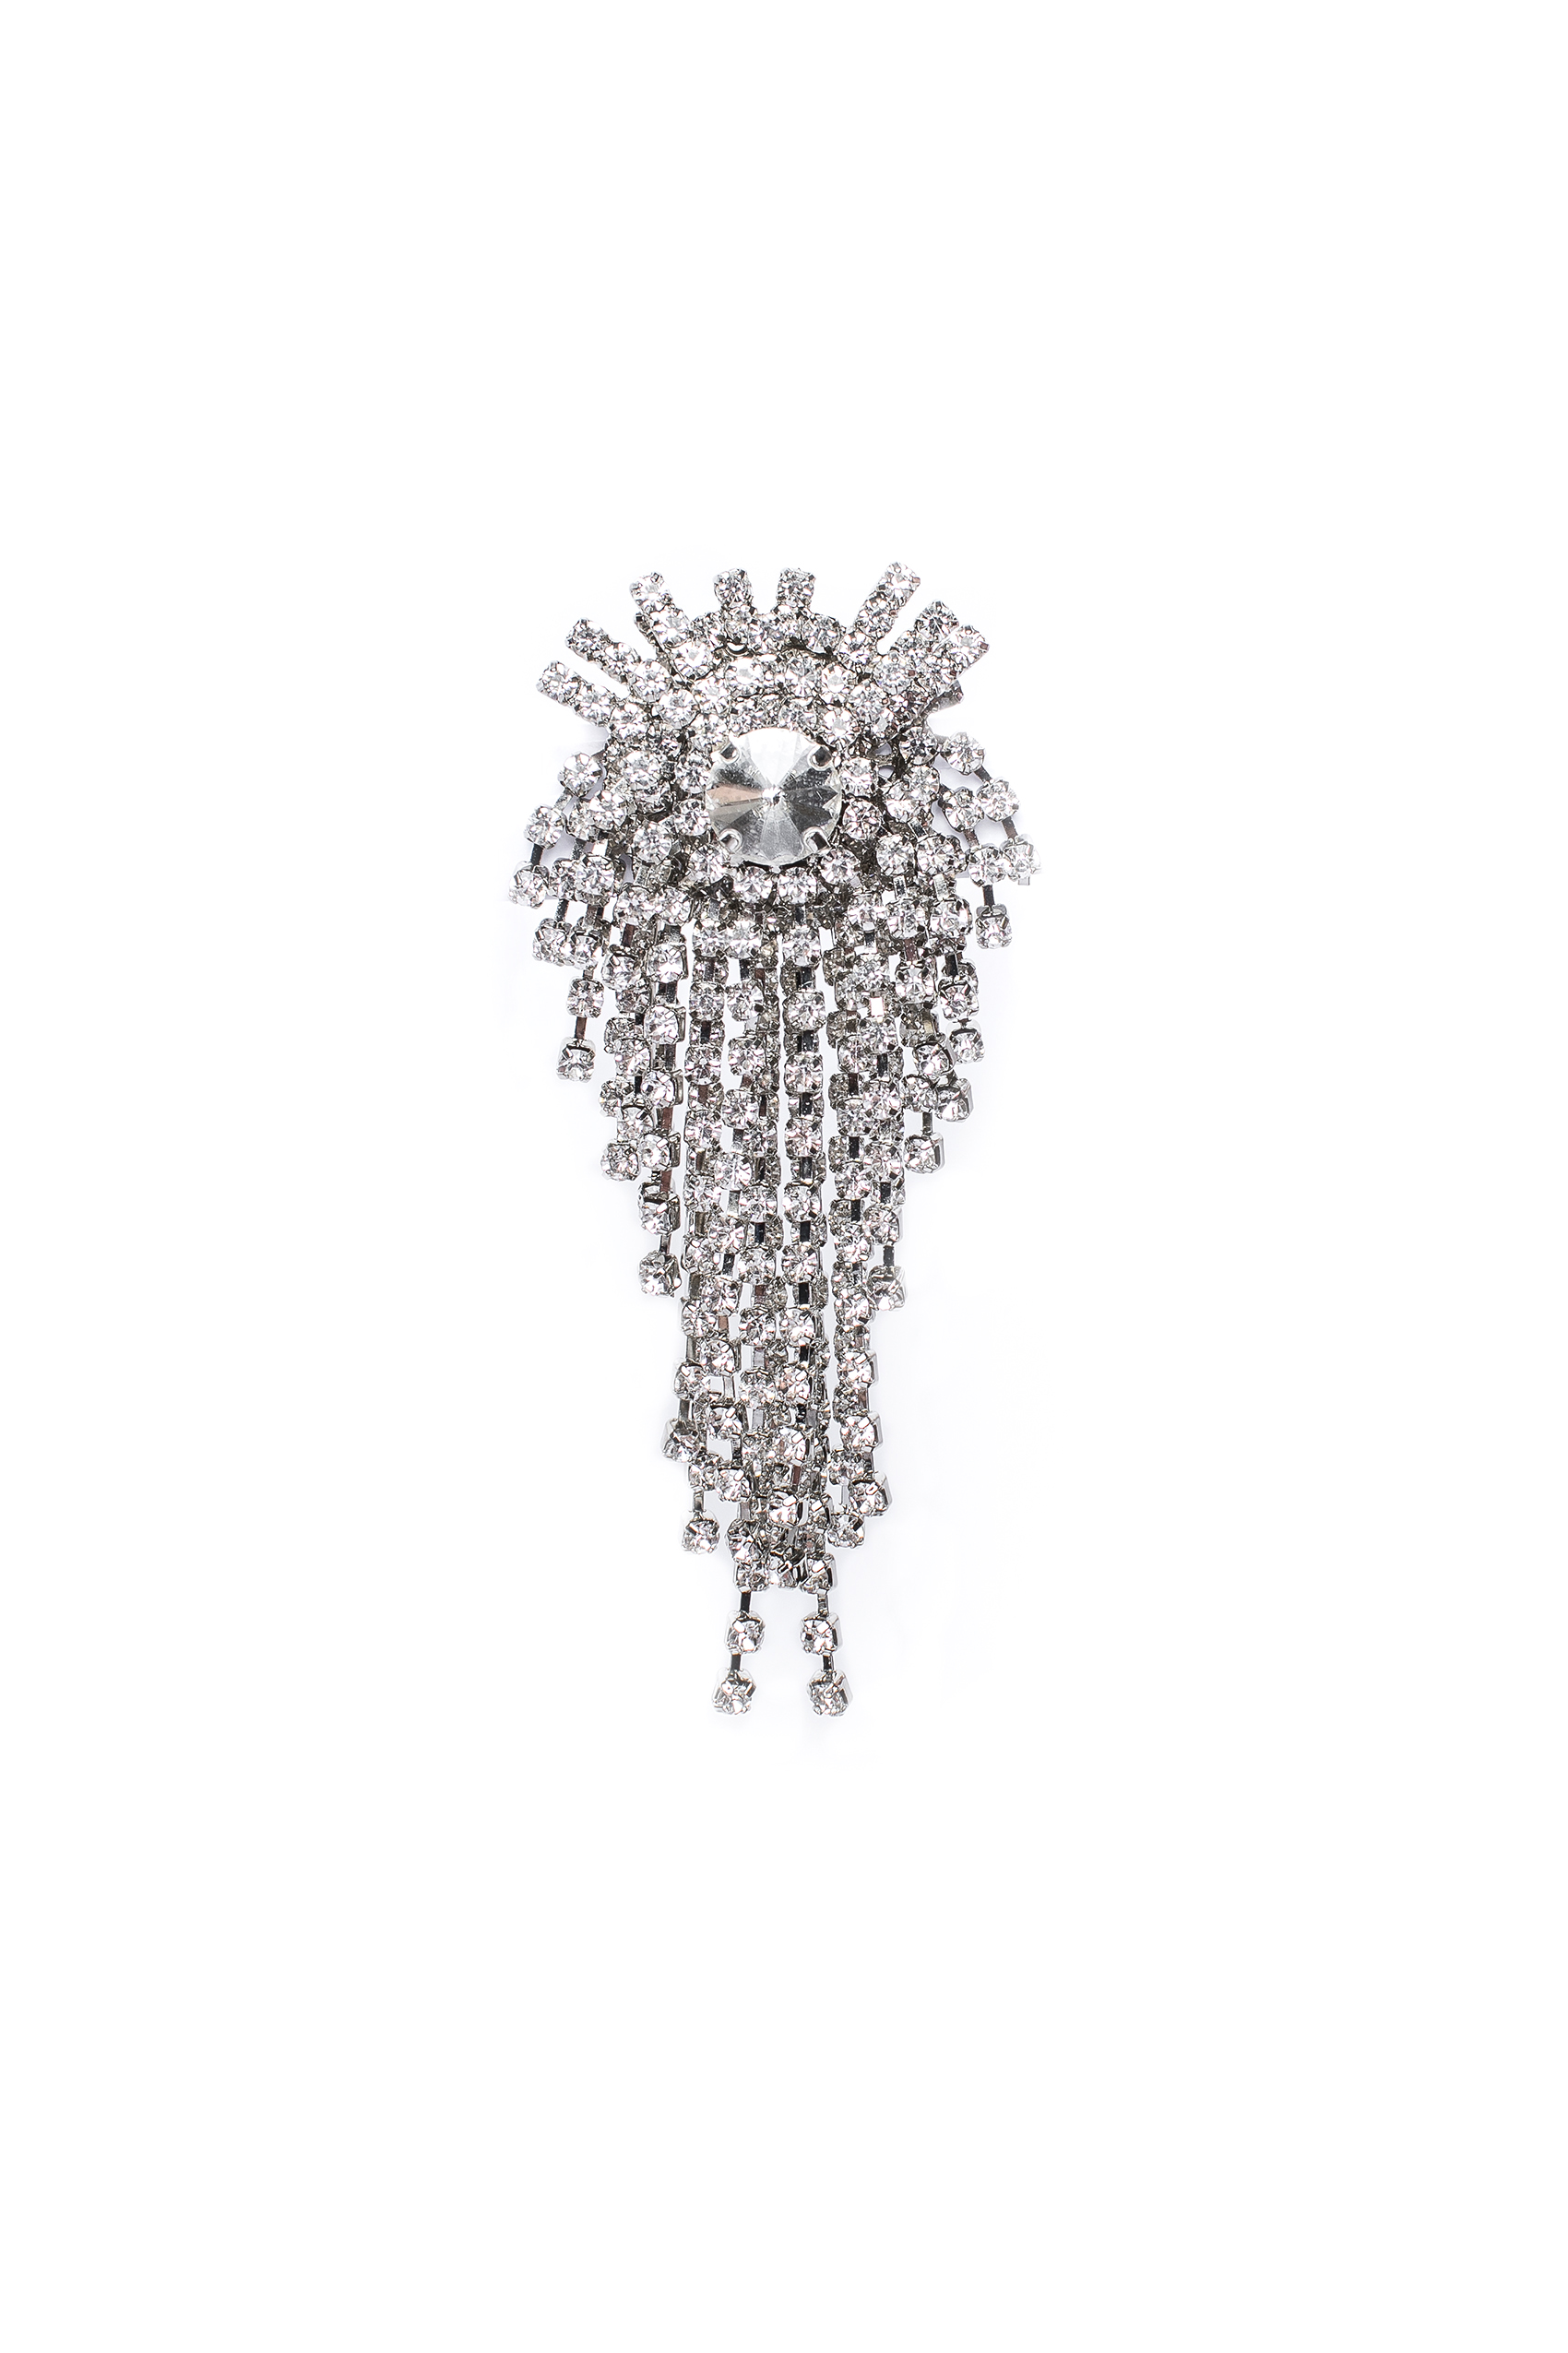 Alexandre Vauthier Cristal Jewellery Earrings